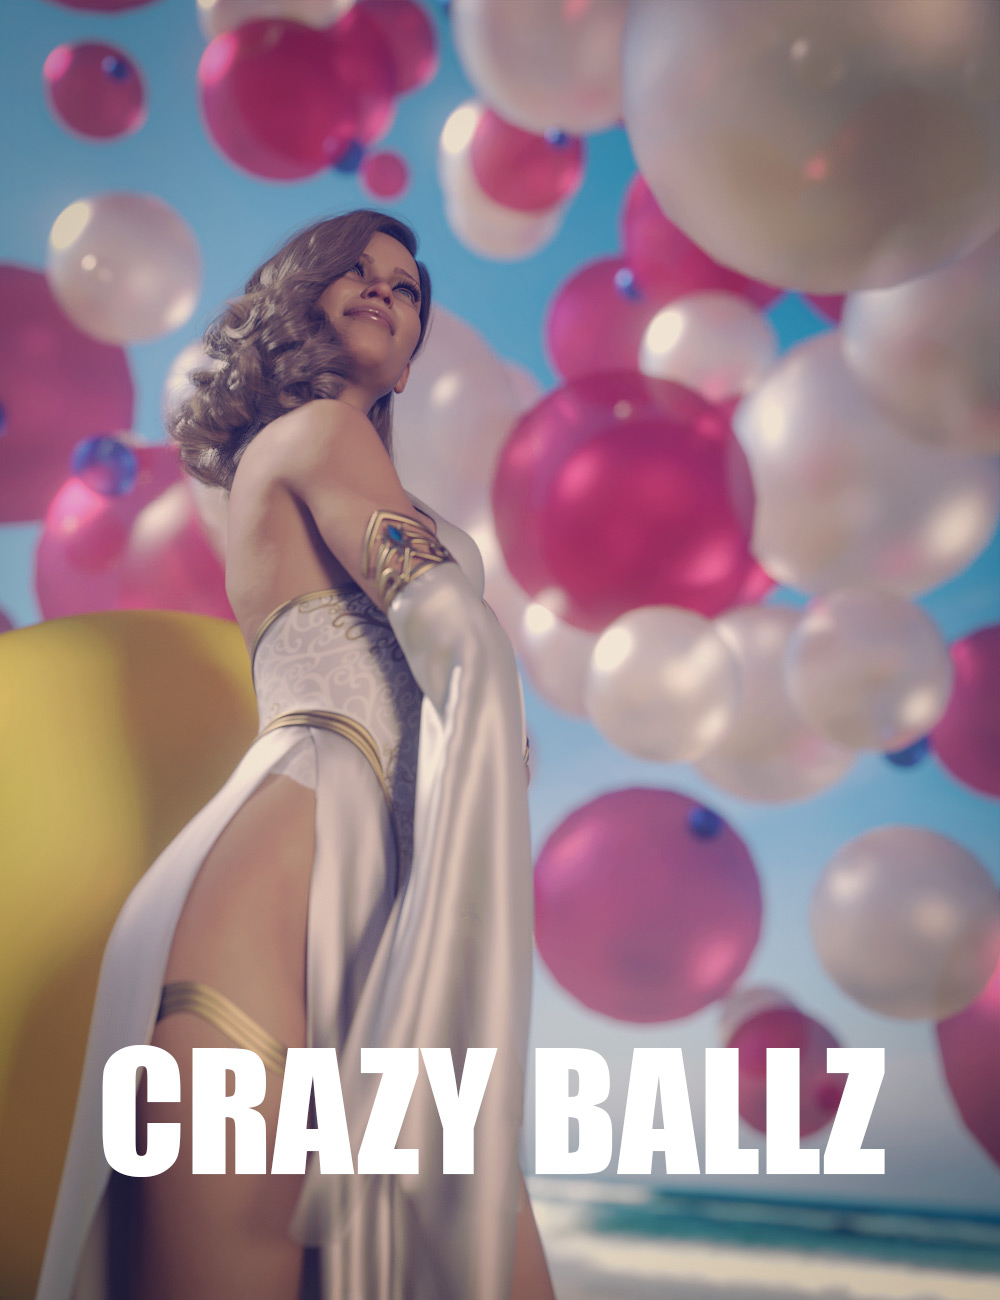 Crazy Ballz by: Dreamlight, 3D Models by Daz 3D